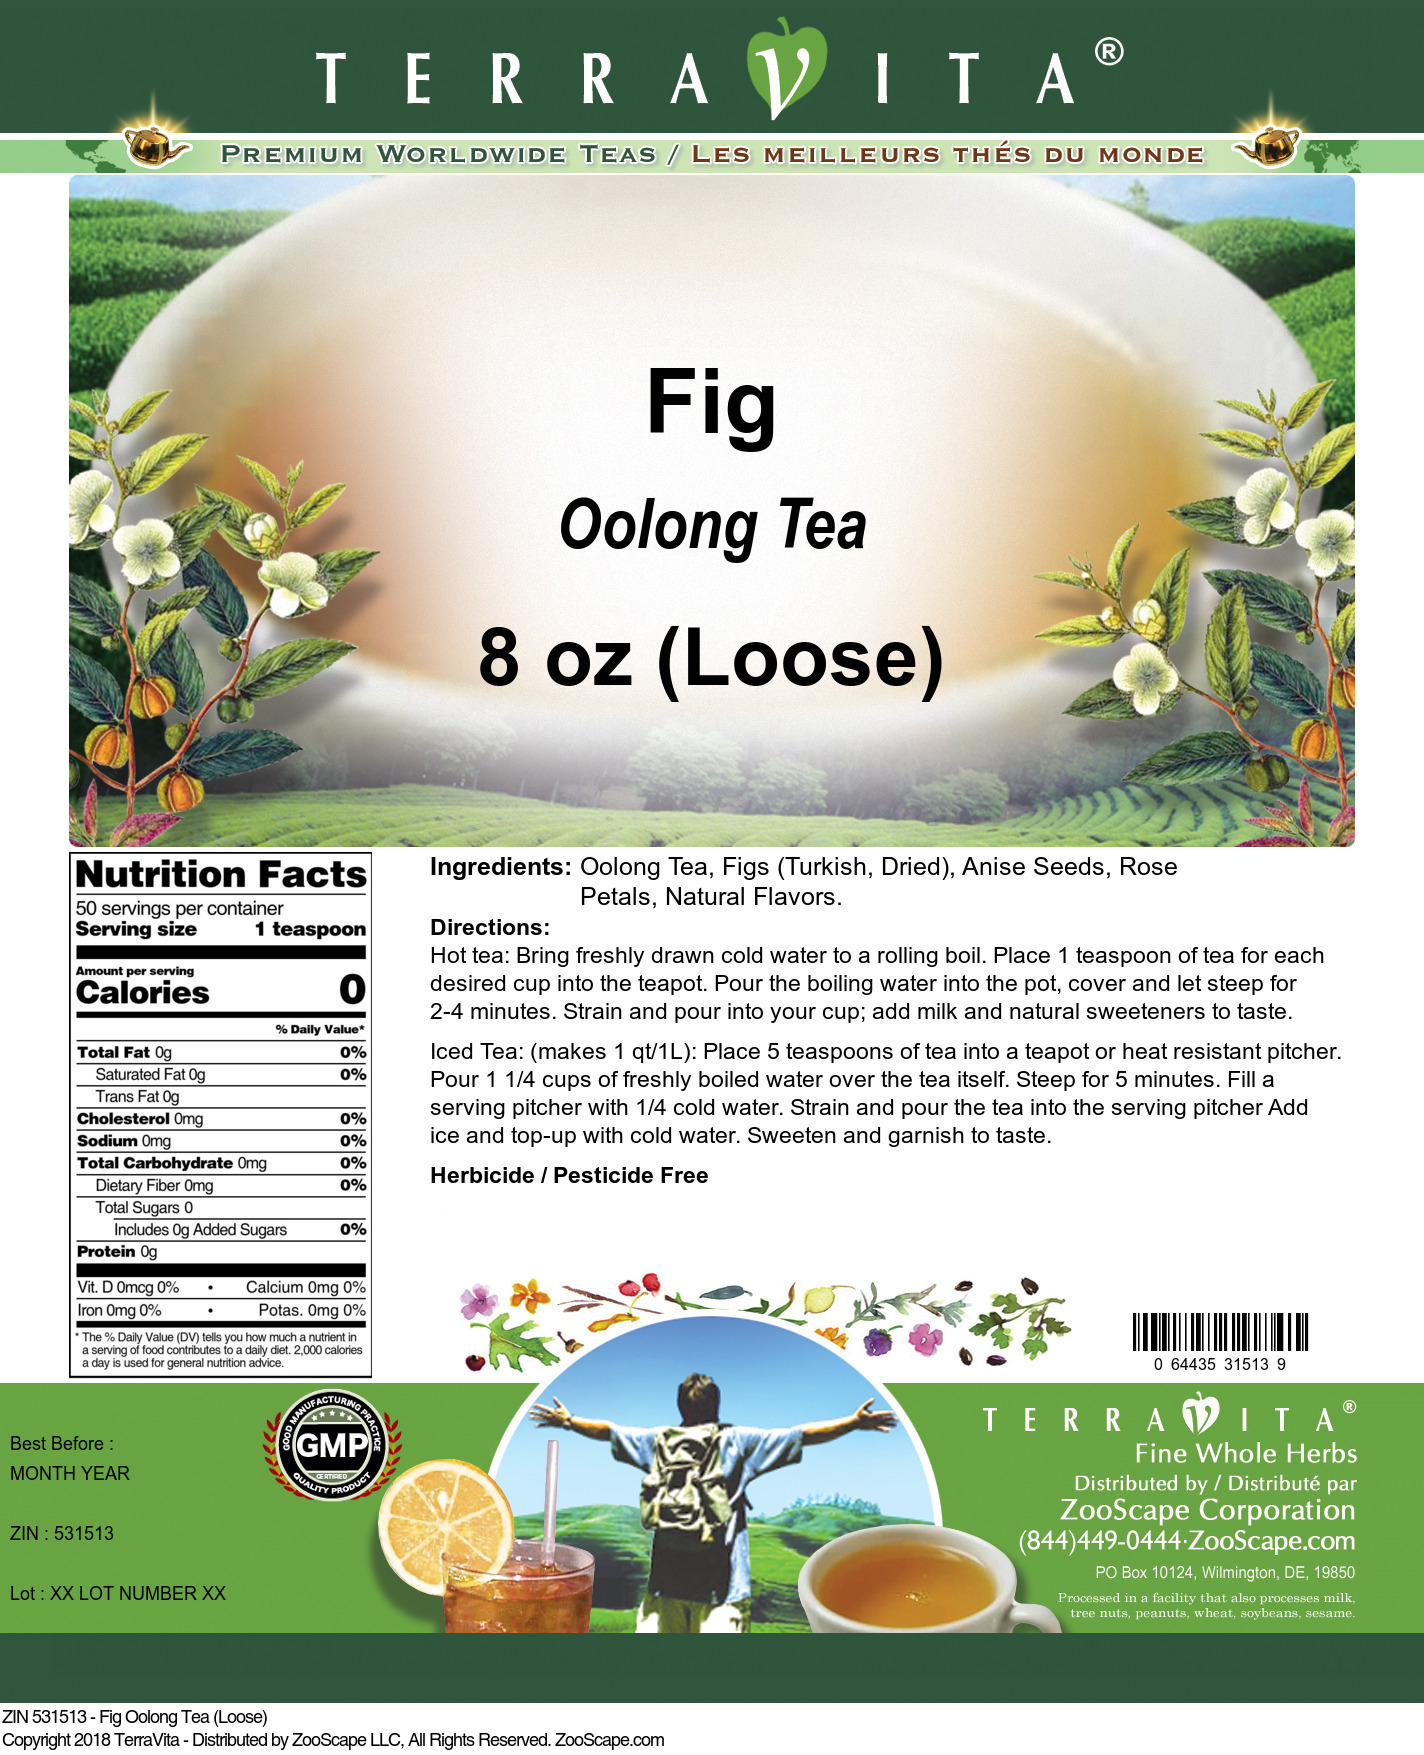 Fig Oolong Tea (Loose)